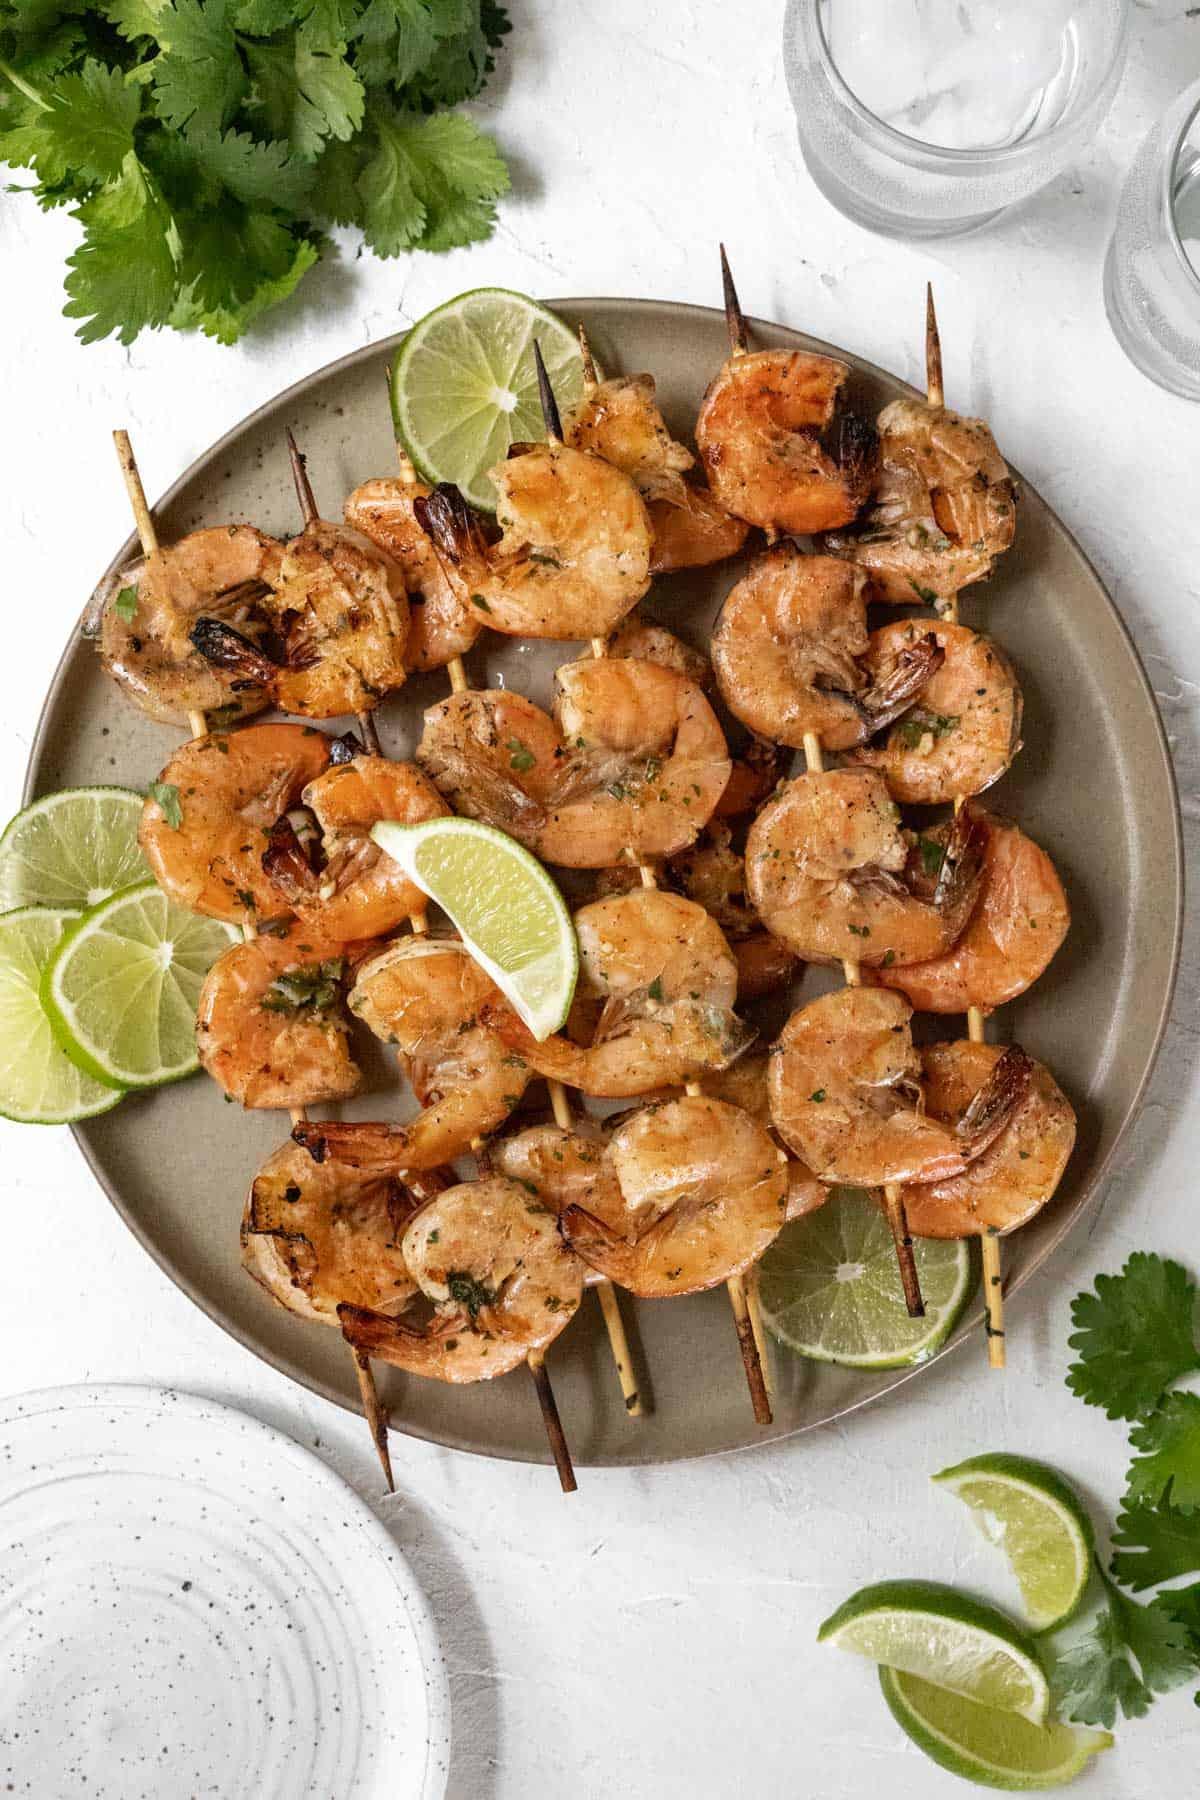 Grilled shrimp skewers garnished with limes on a beige plate.